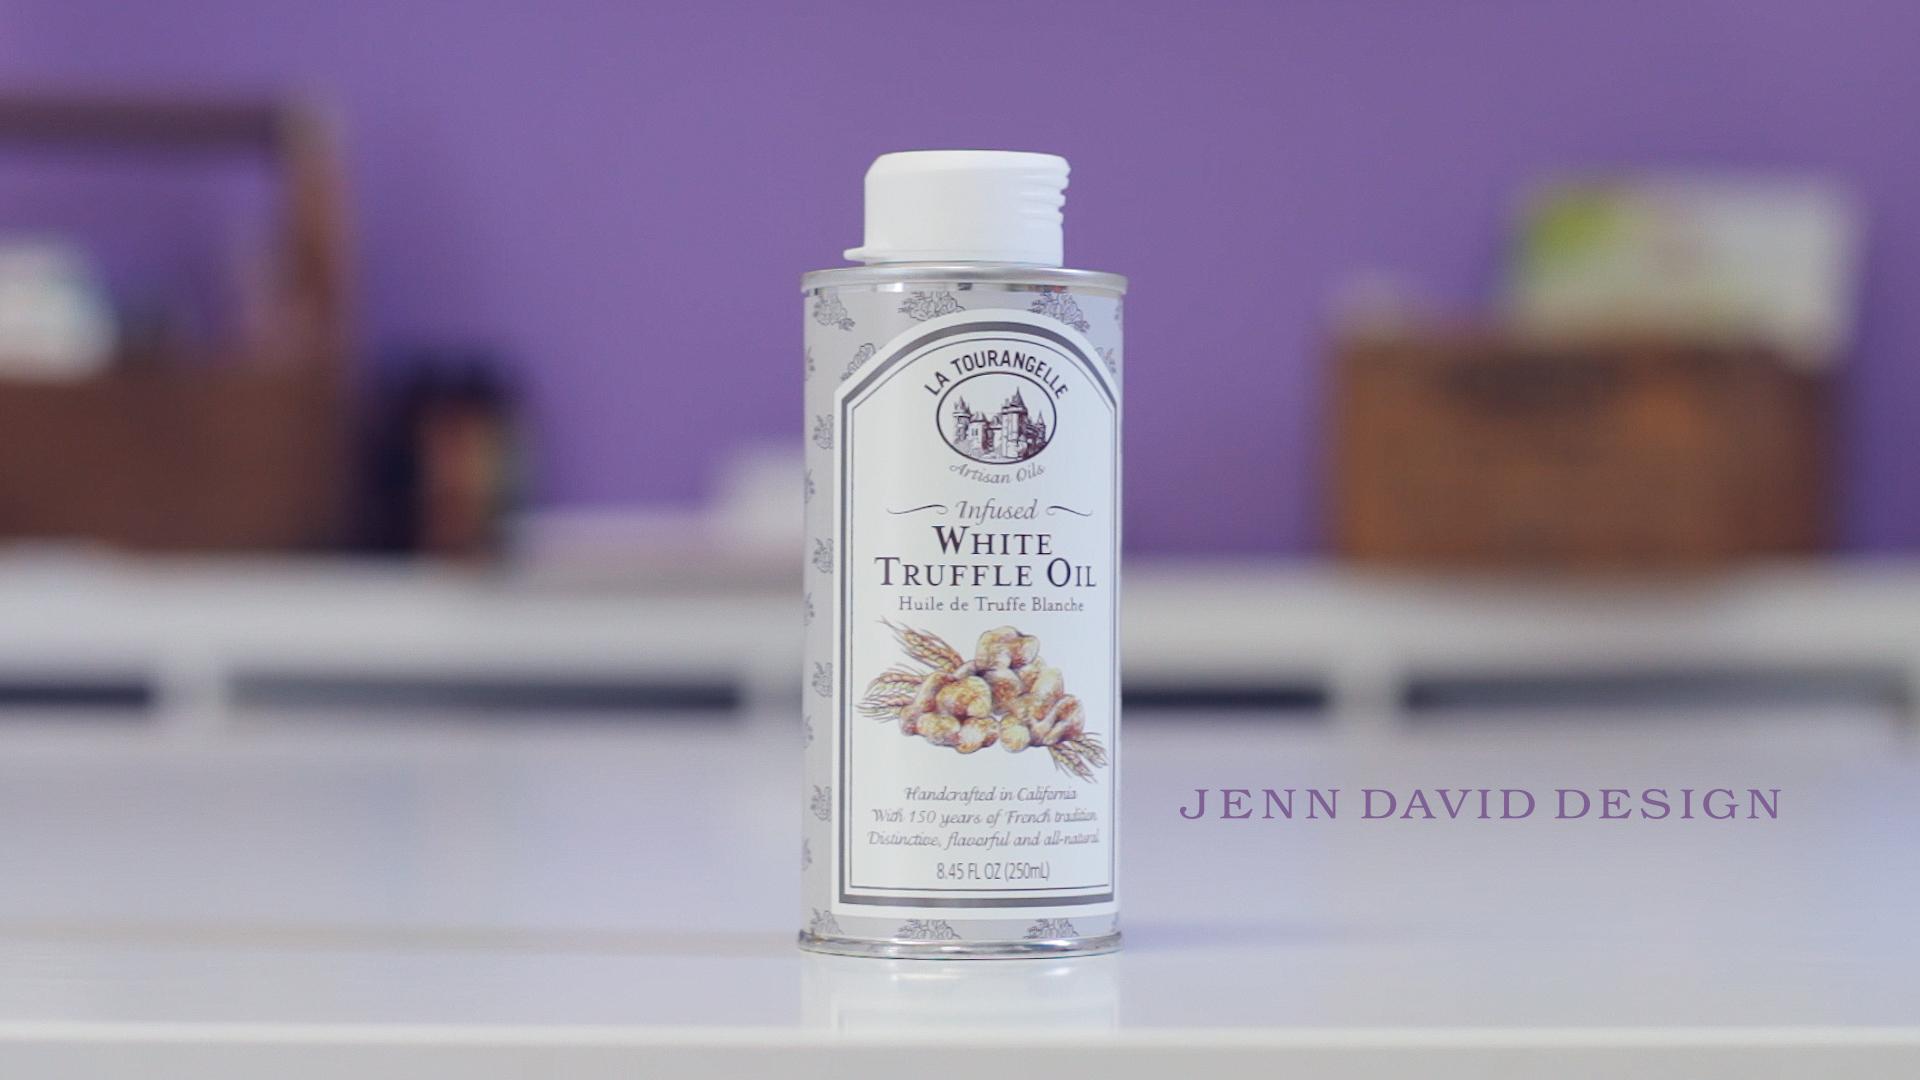 Jenn David Design studio video profile.